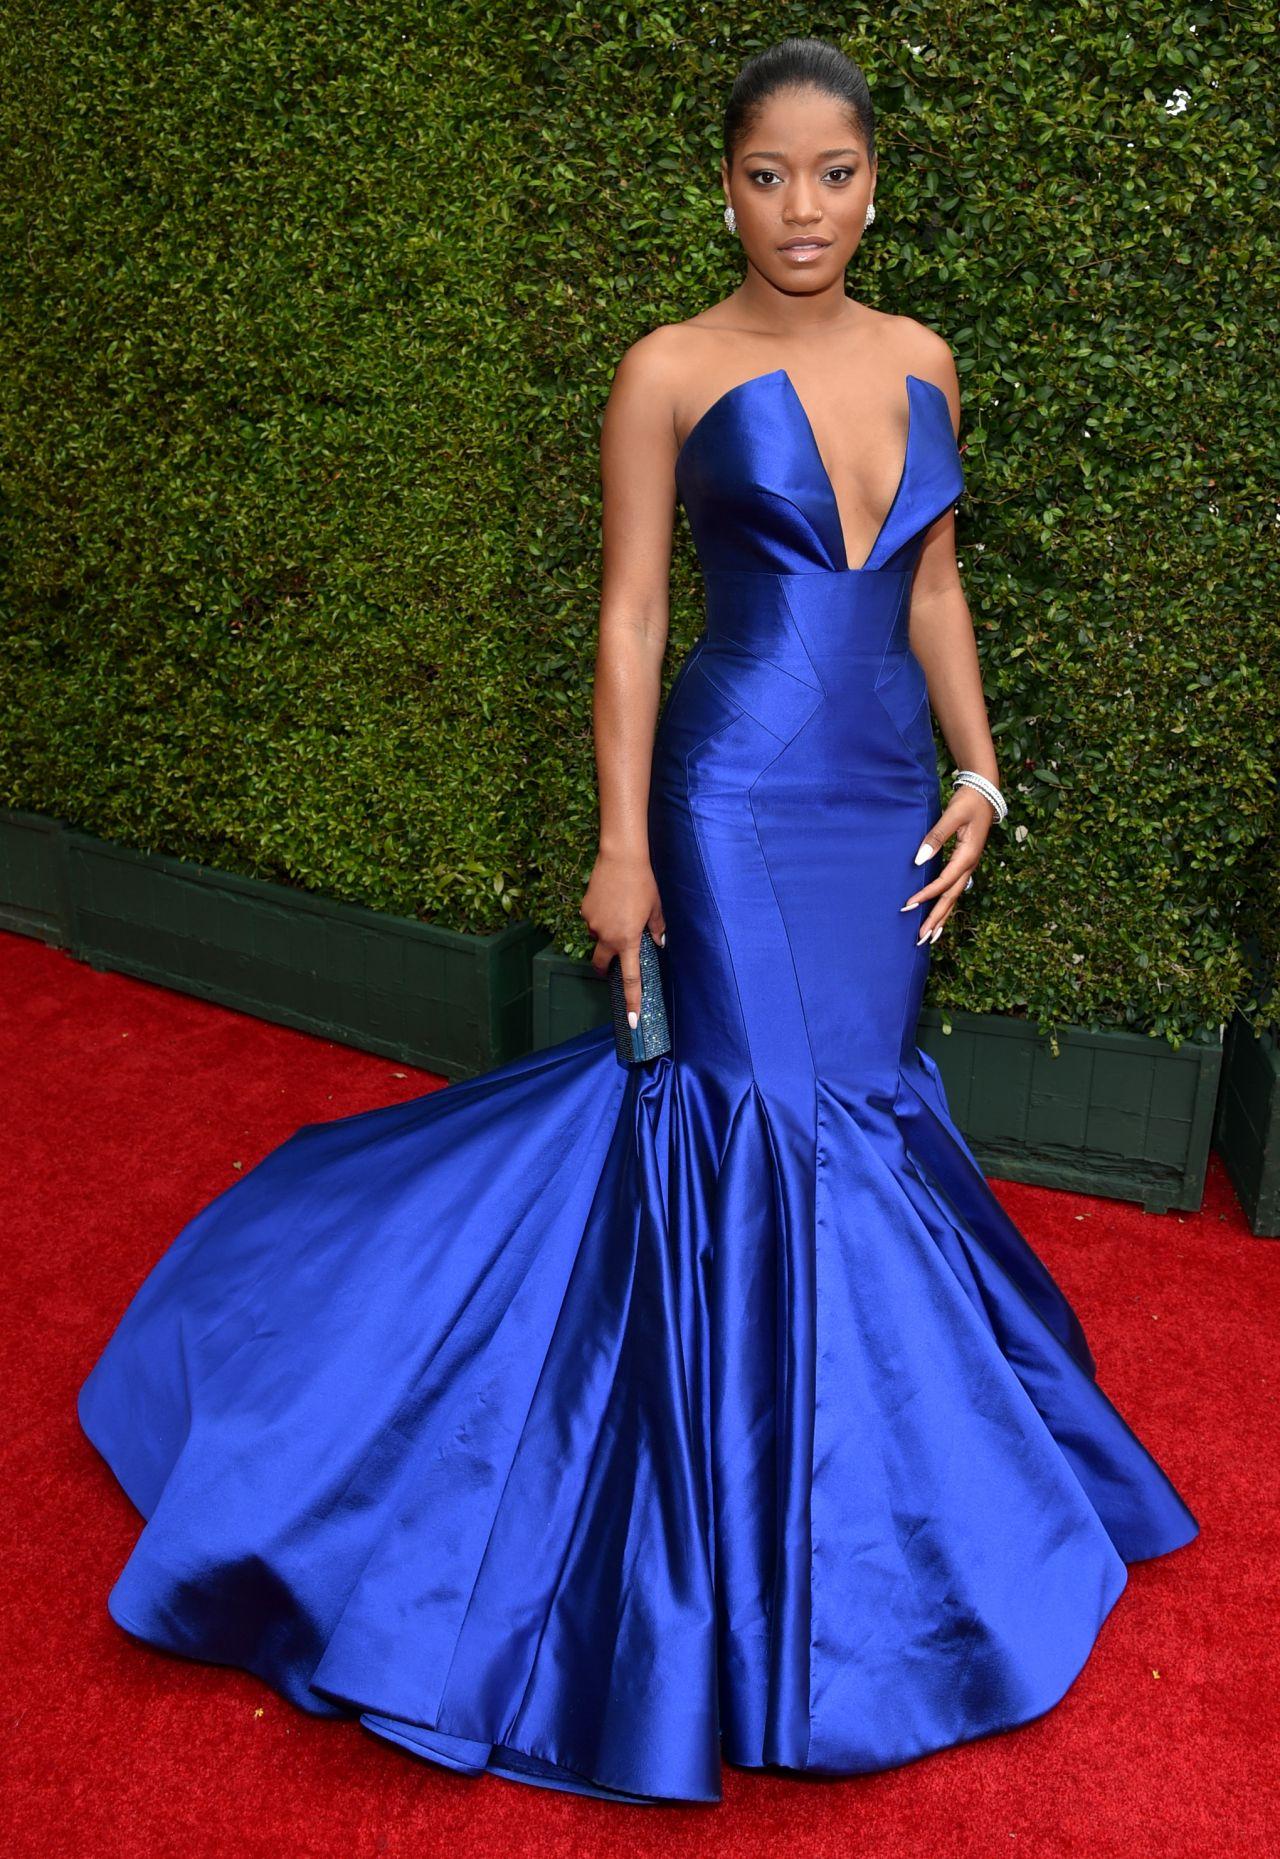 Keke Palmer Leggy in Mini Dress - Out in New York City ... |Keke Palmer 2014